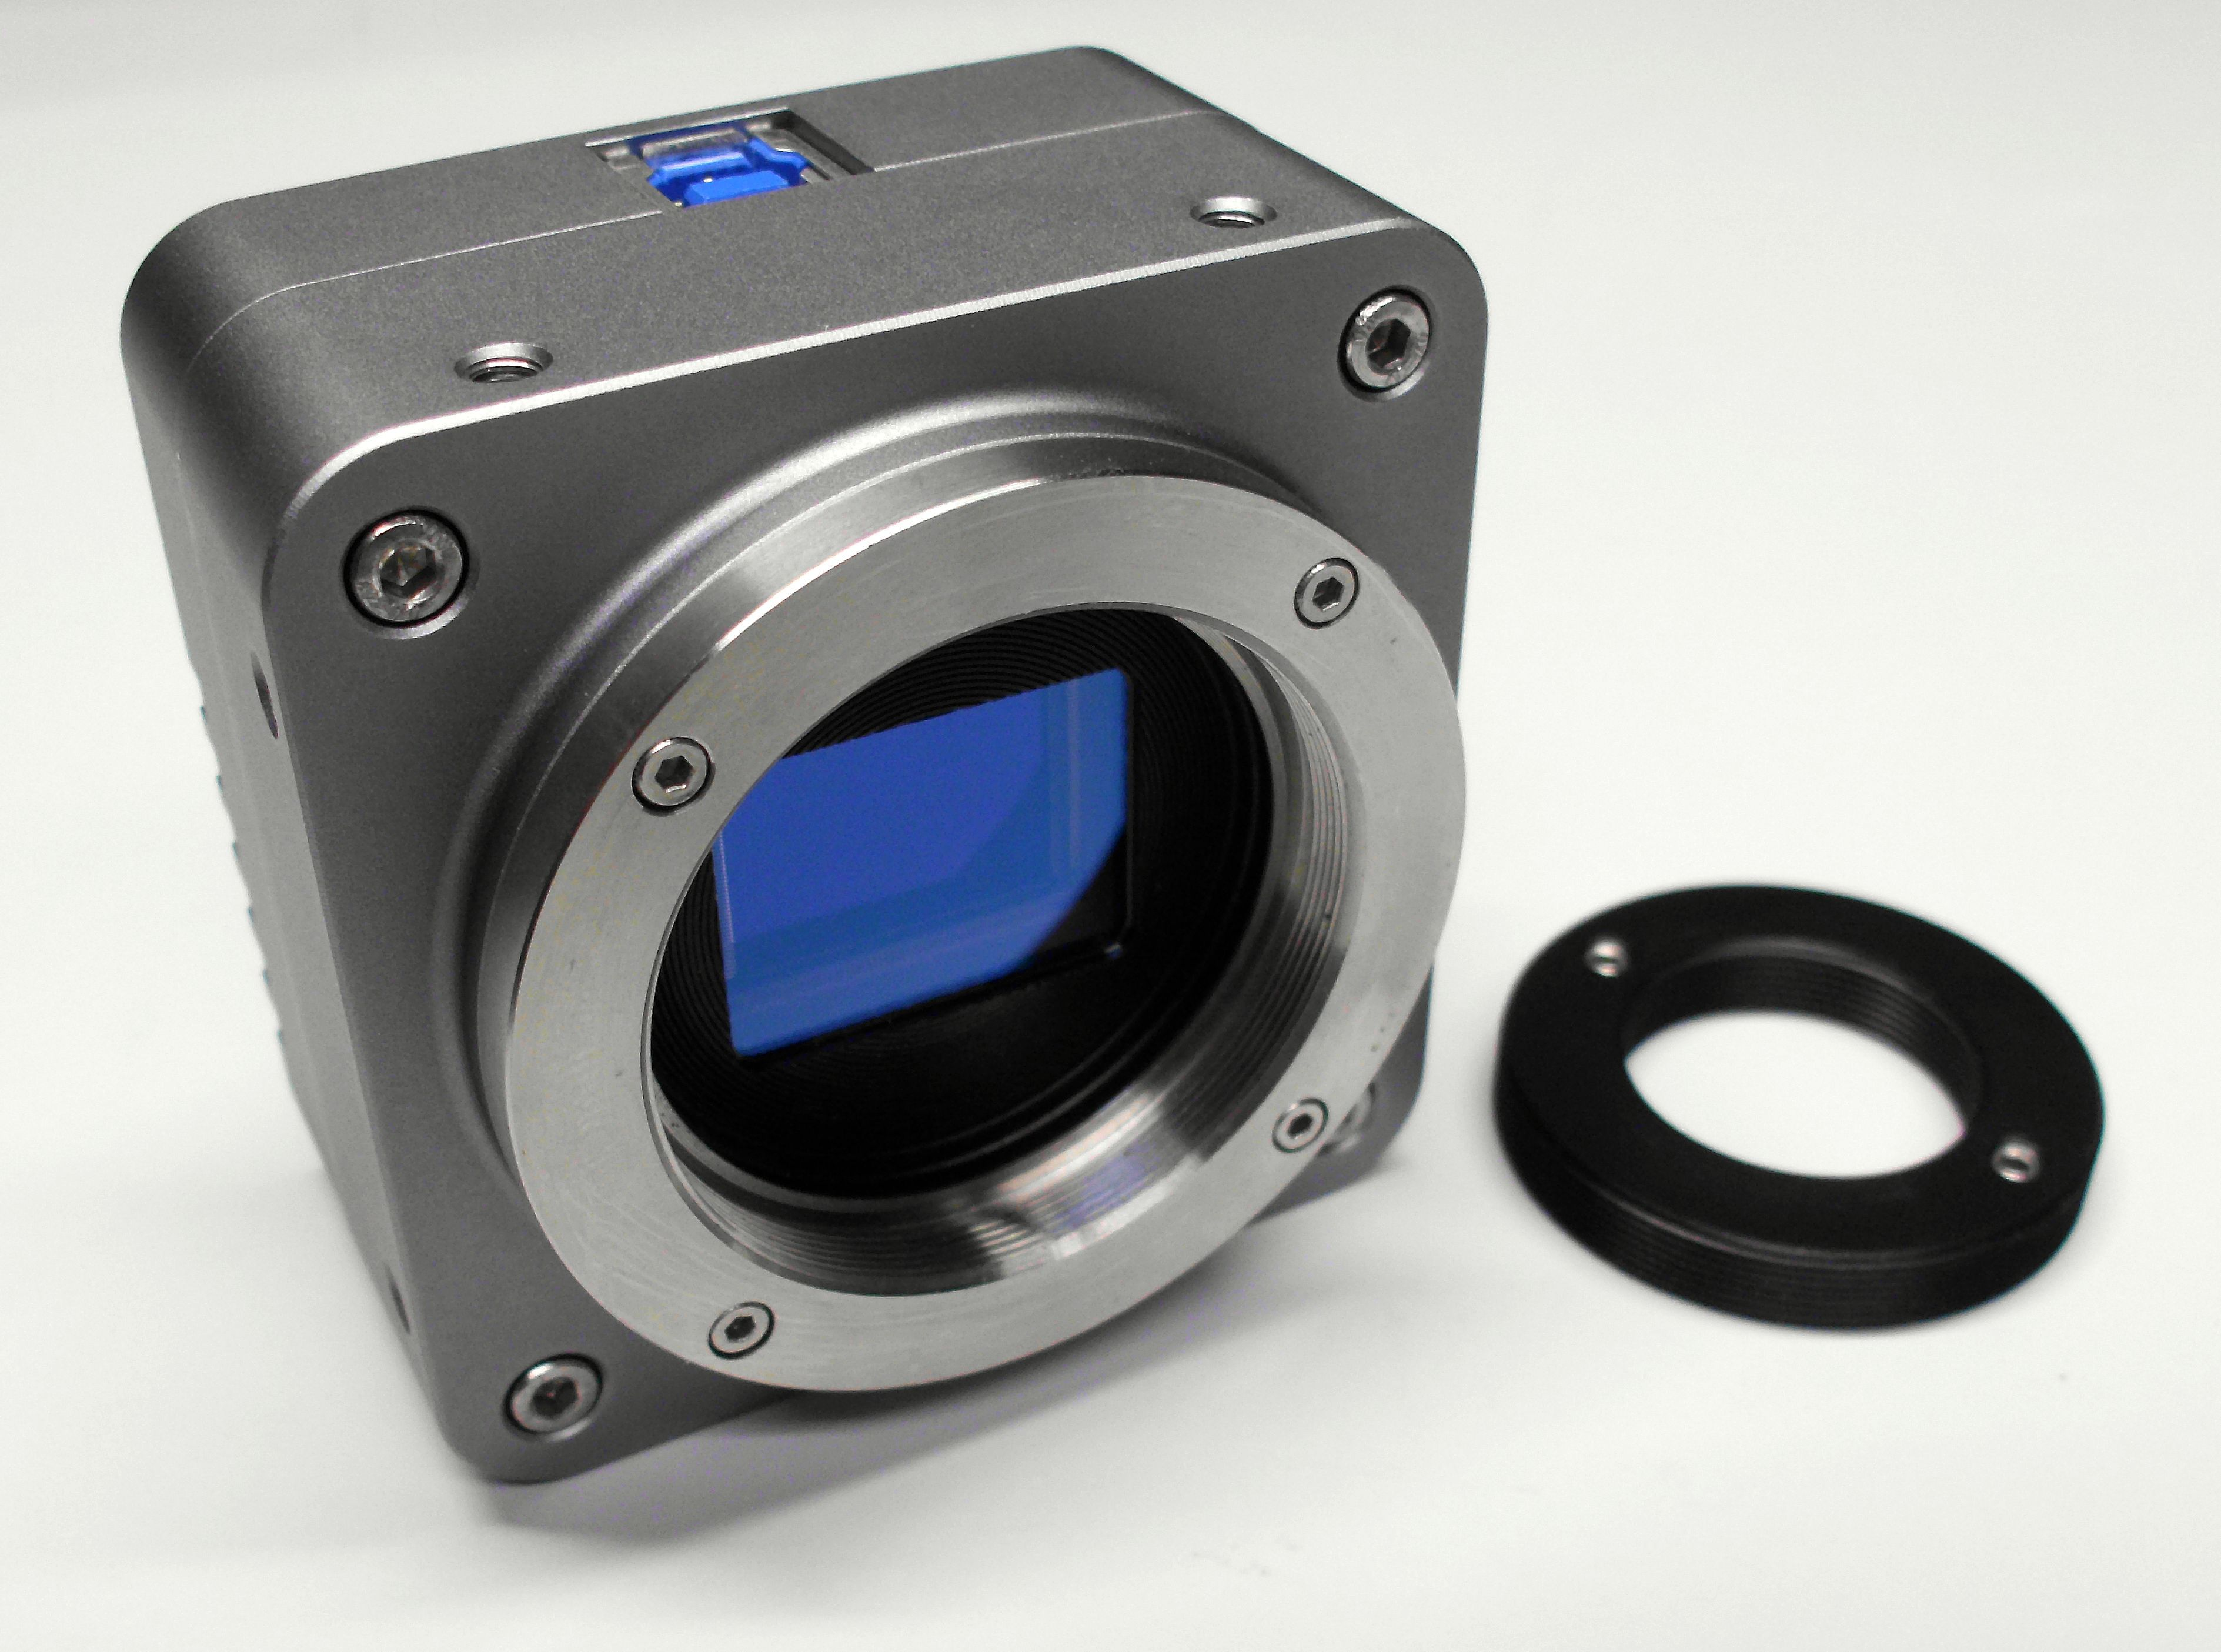 EHD imaging GmbH - InGaAs - UV - CCD - CMOS Cameras and